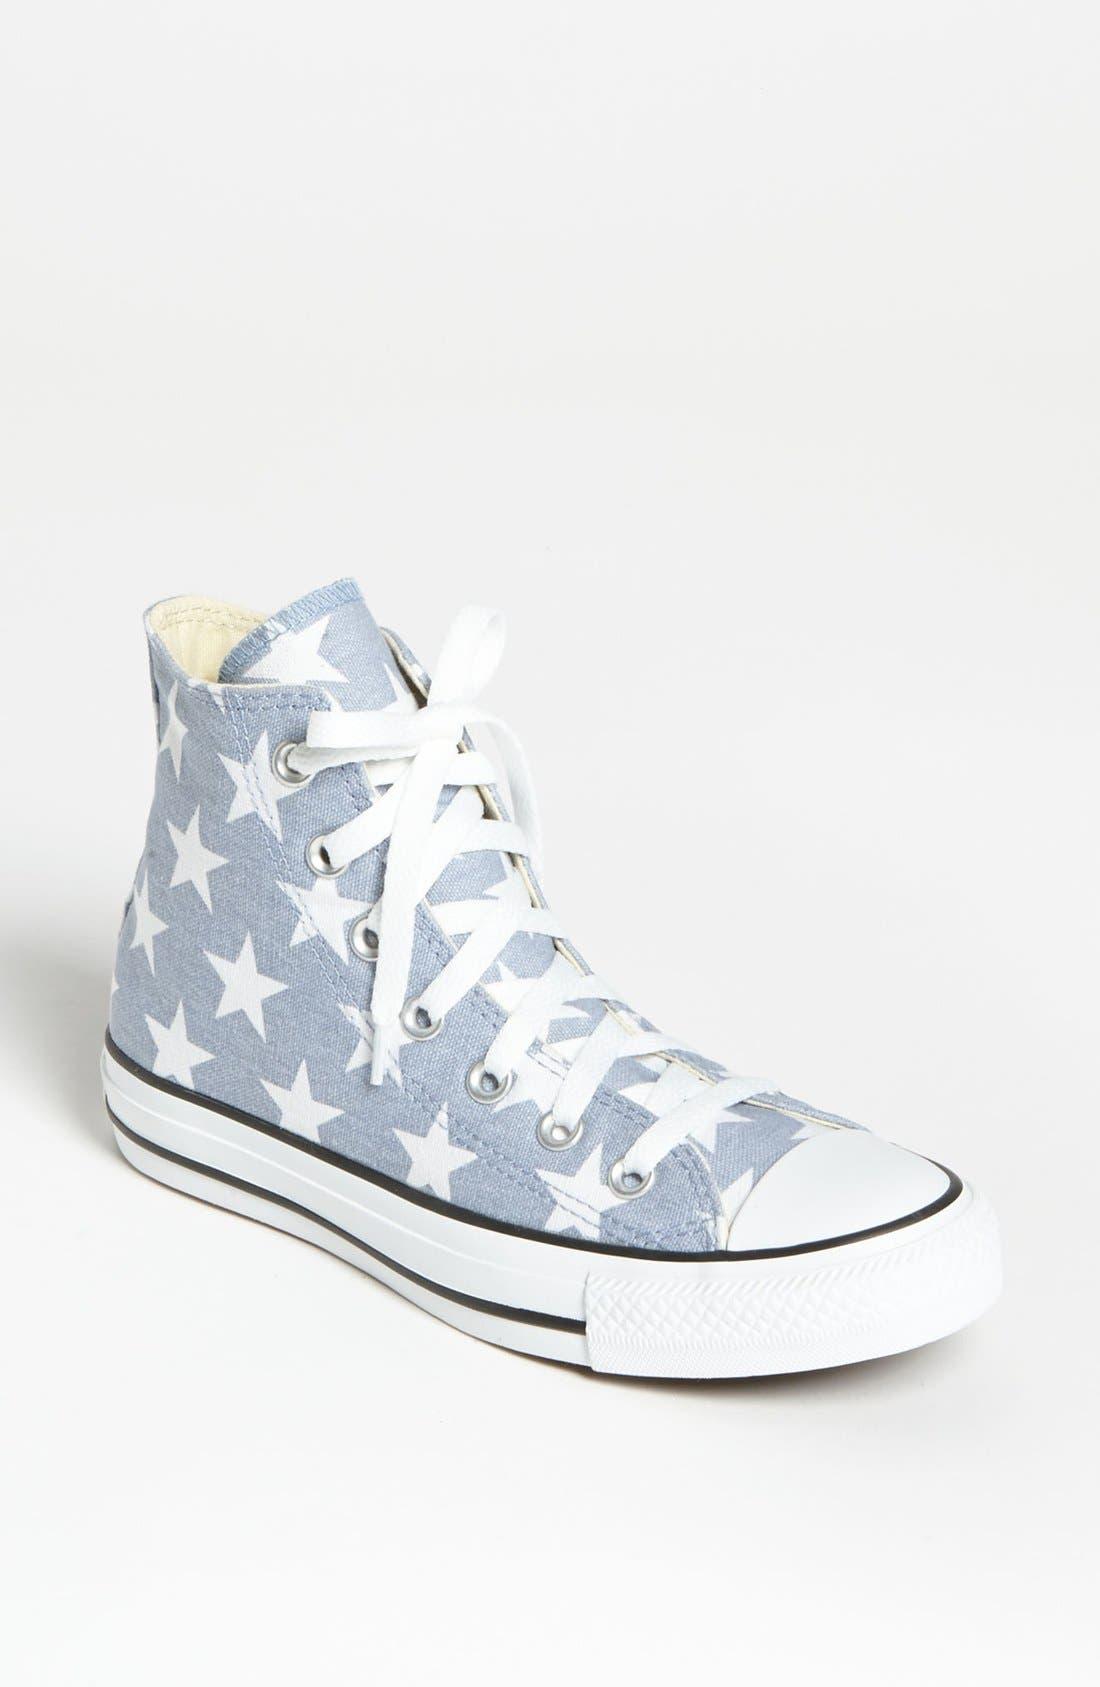 Main Image - Converse Chuck Taylor® All Star® Stars High Top Sneaker (Women)